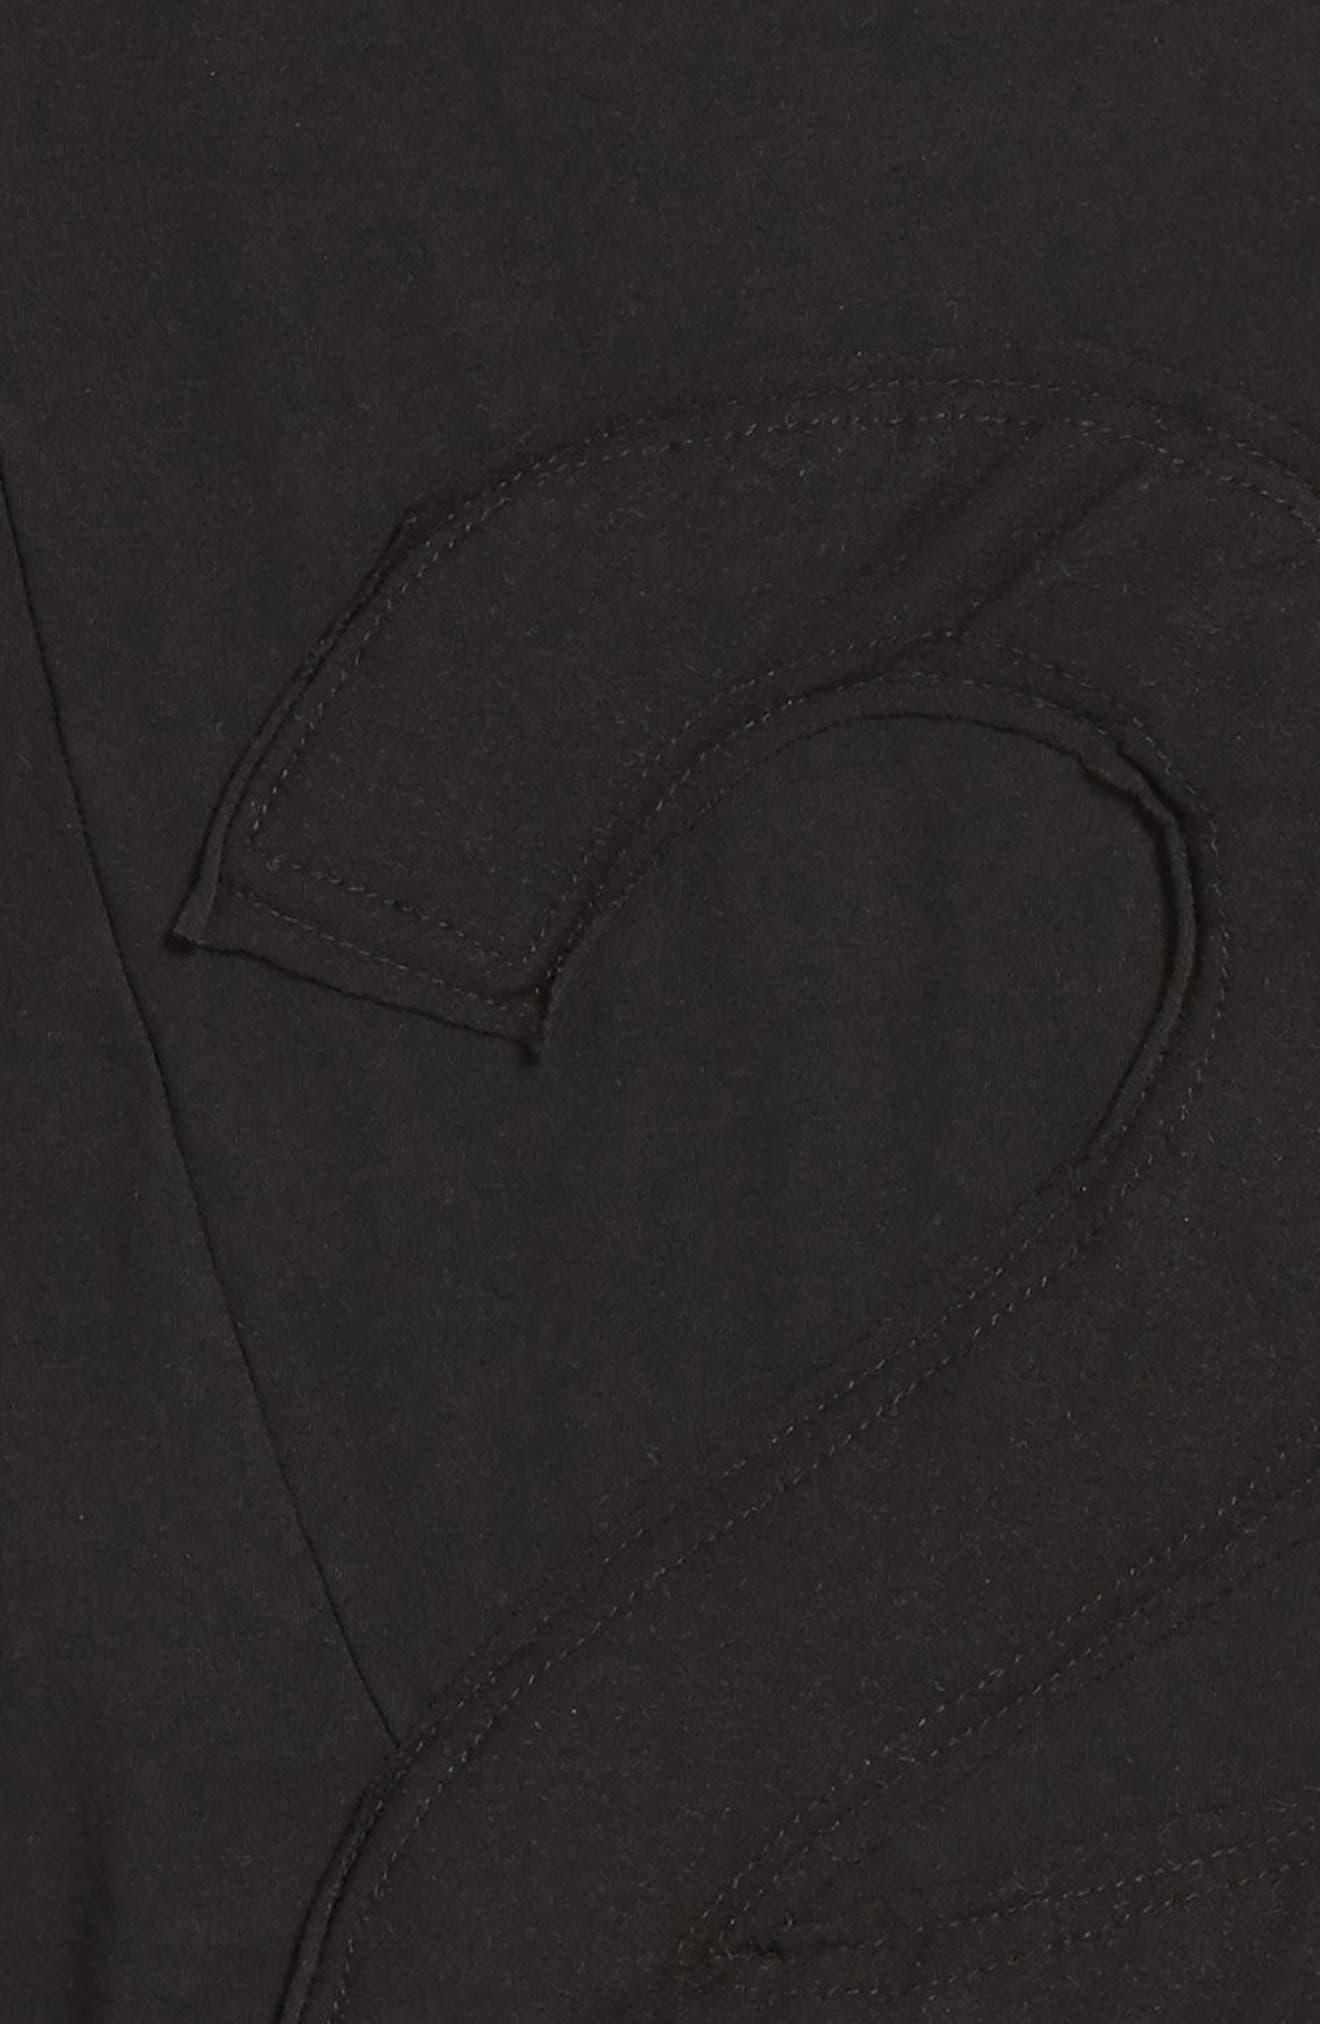 Puffy Number Penguin Shirt,                             Alternate thumbnail 2, color,                             Black